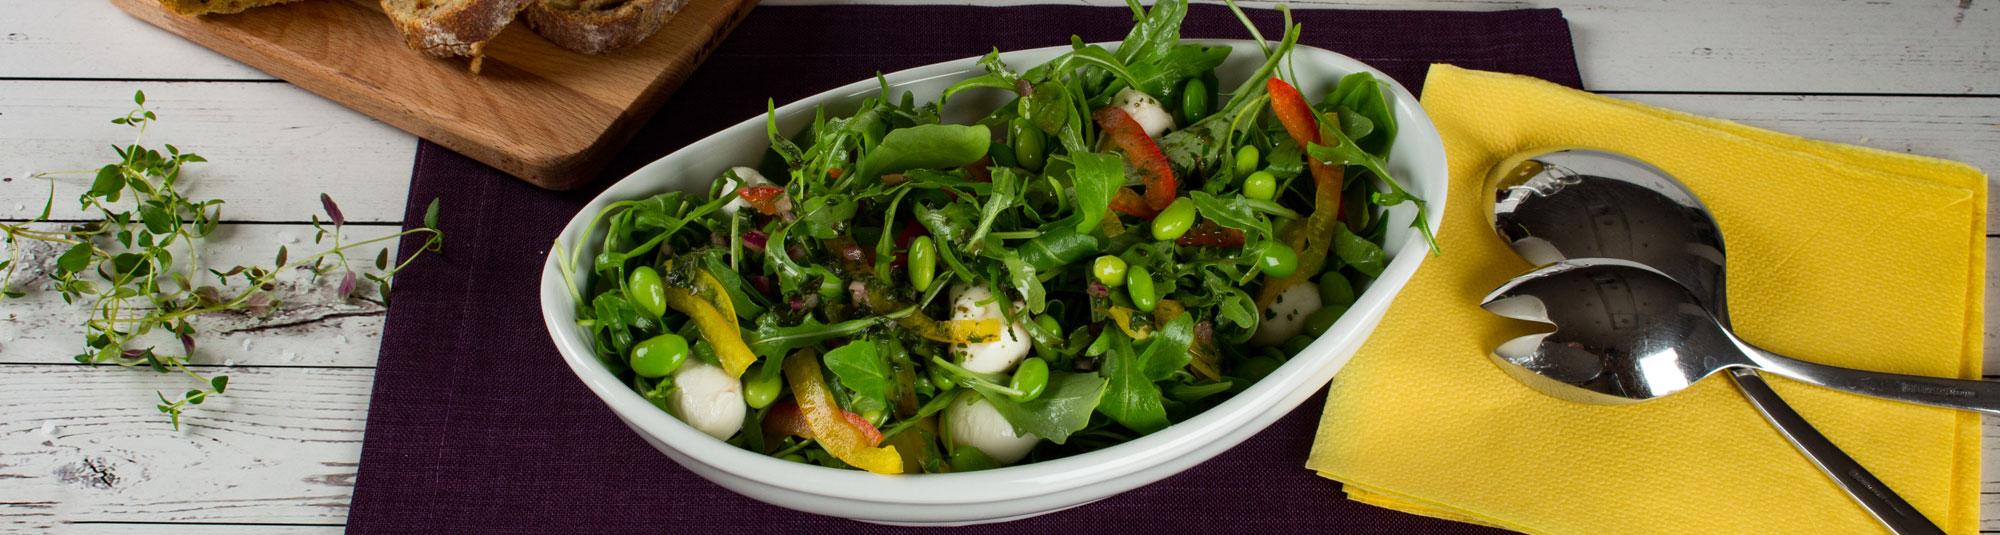 Iglo Rucola Salat verfeinert mit Mozarella